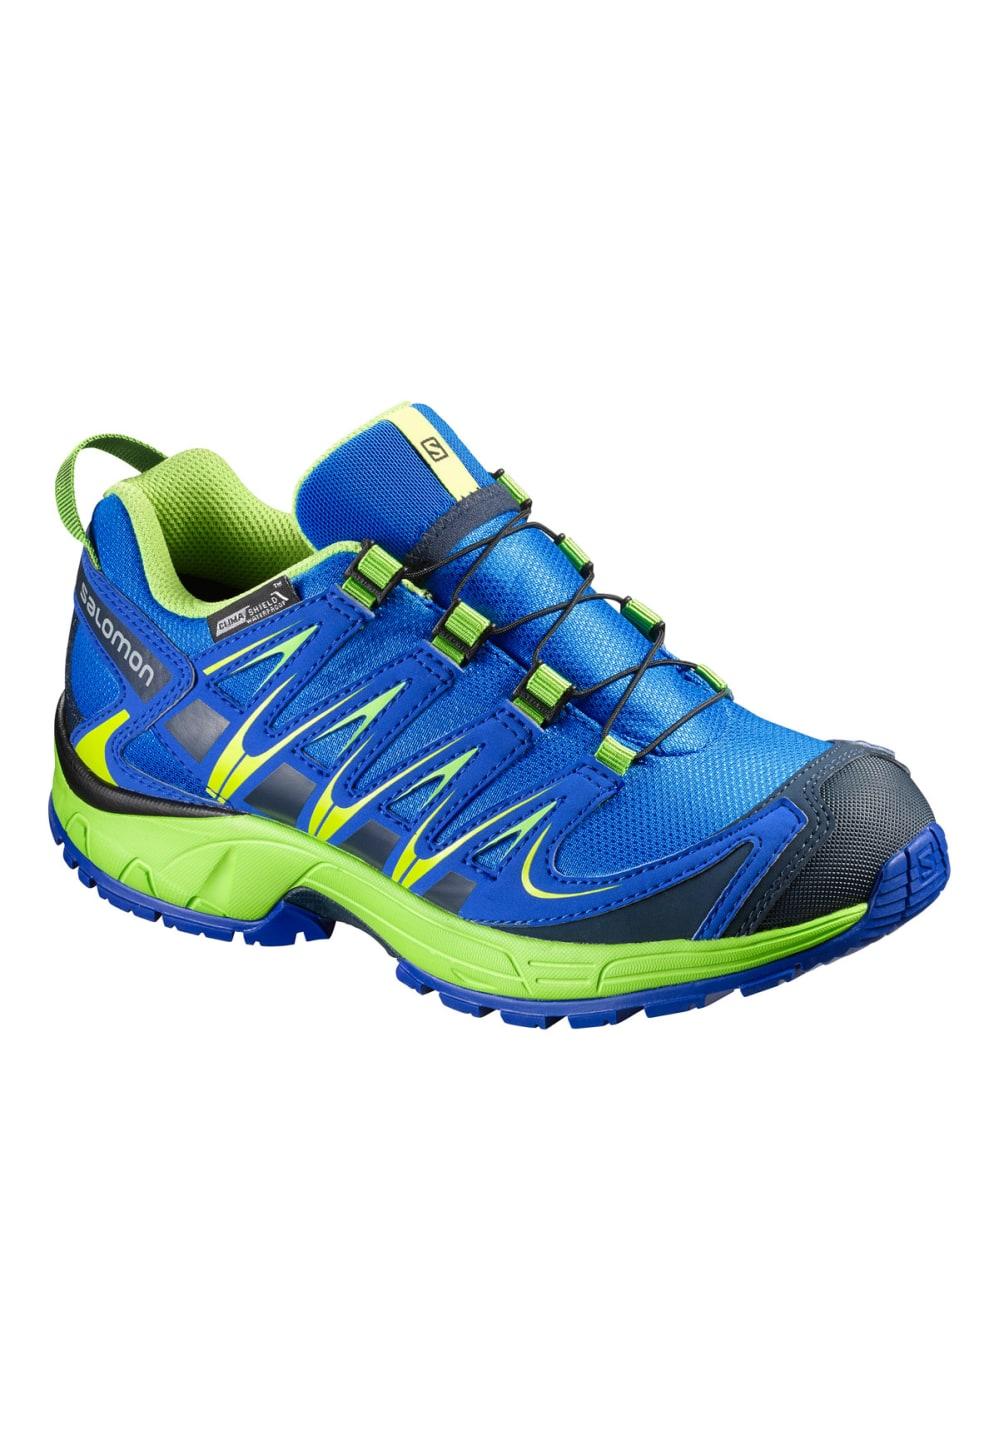 Xa Pro J Chaussures 21run At Salomon Xpywcp 3d Running Wp Cs Bleu twtq4FU